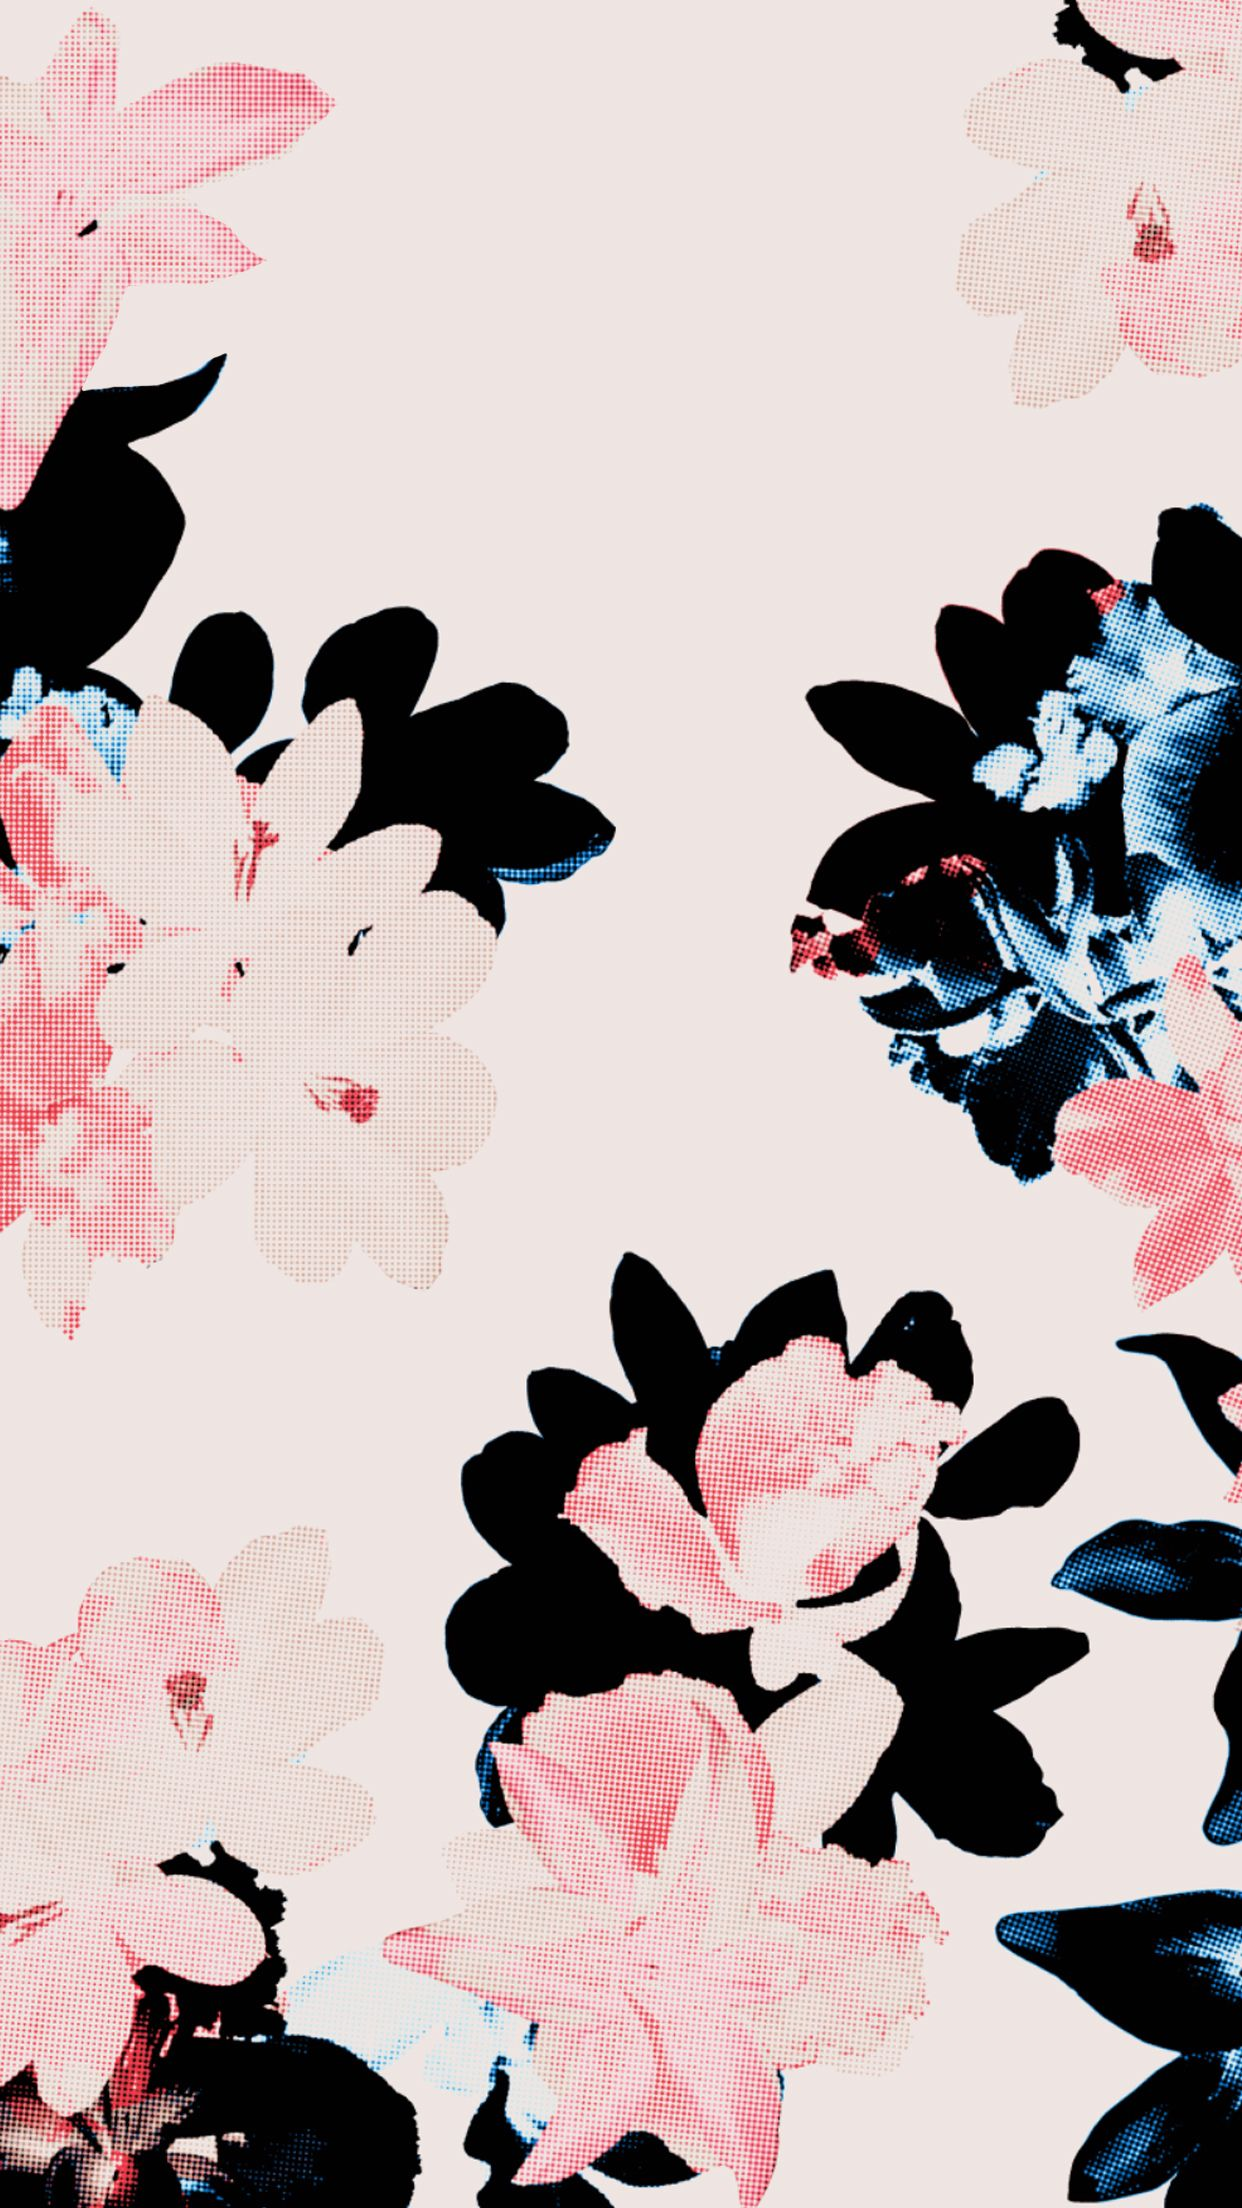 Pinterest//AugustKunce   Wallpapers   Iphone wallpaper, Wallpaper, Iphone